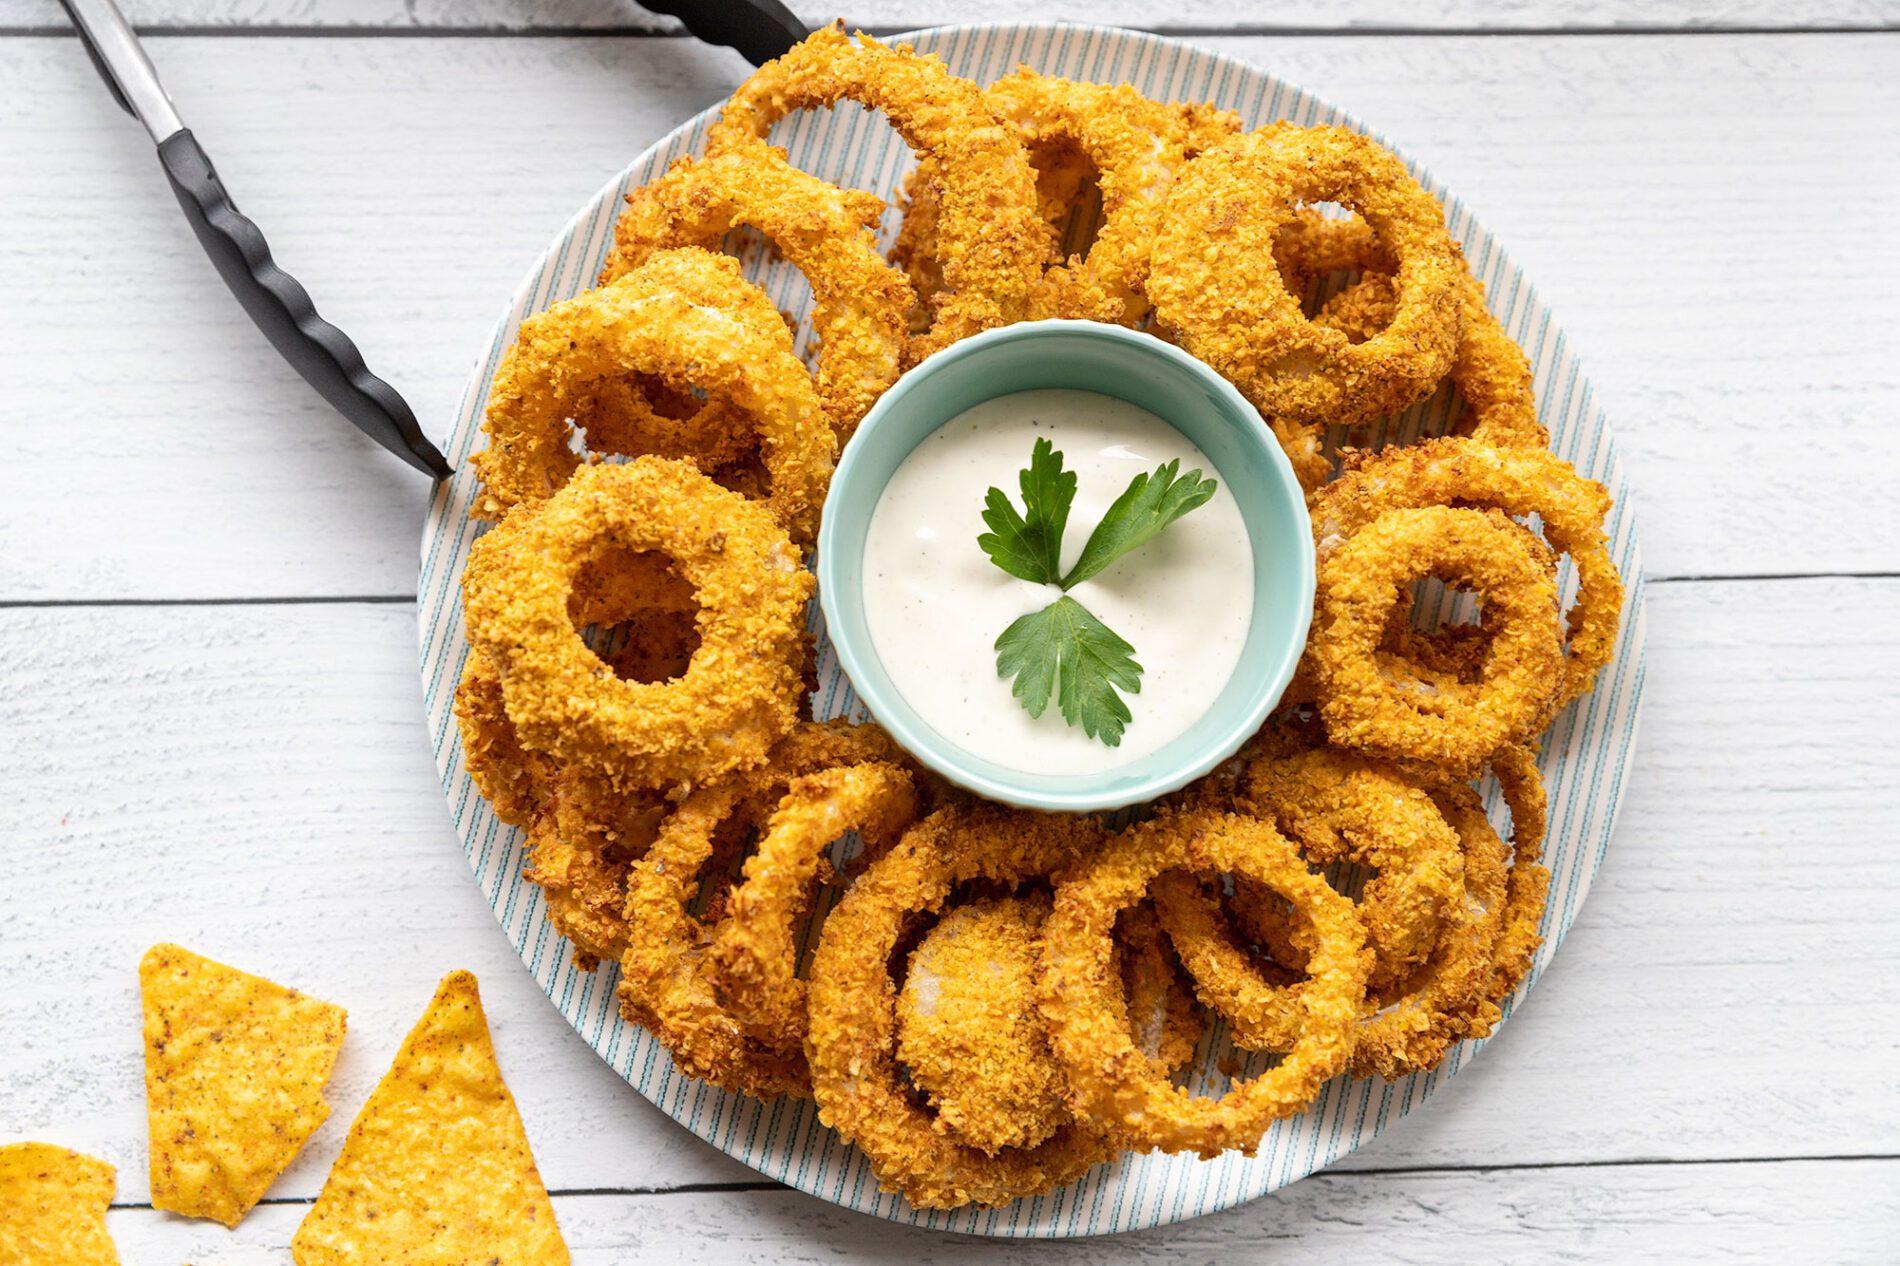 air fryer Doritos onion rings with cool ranch Doritos